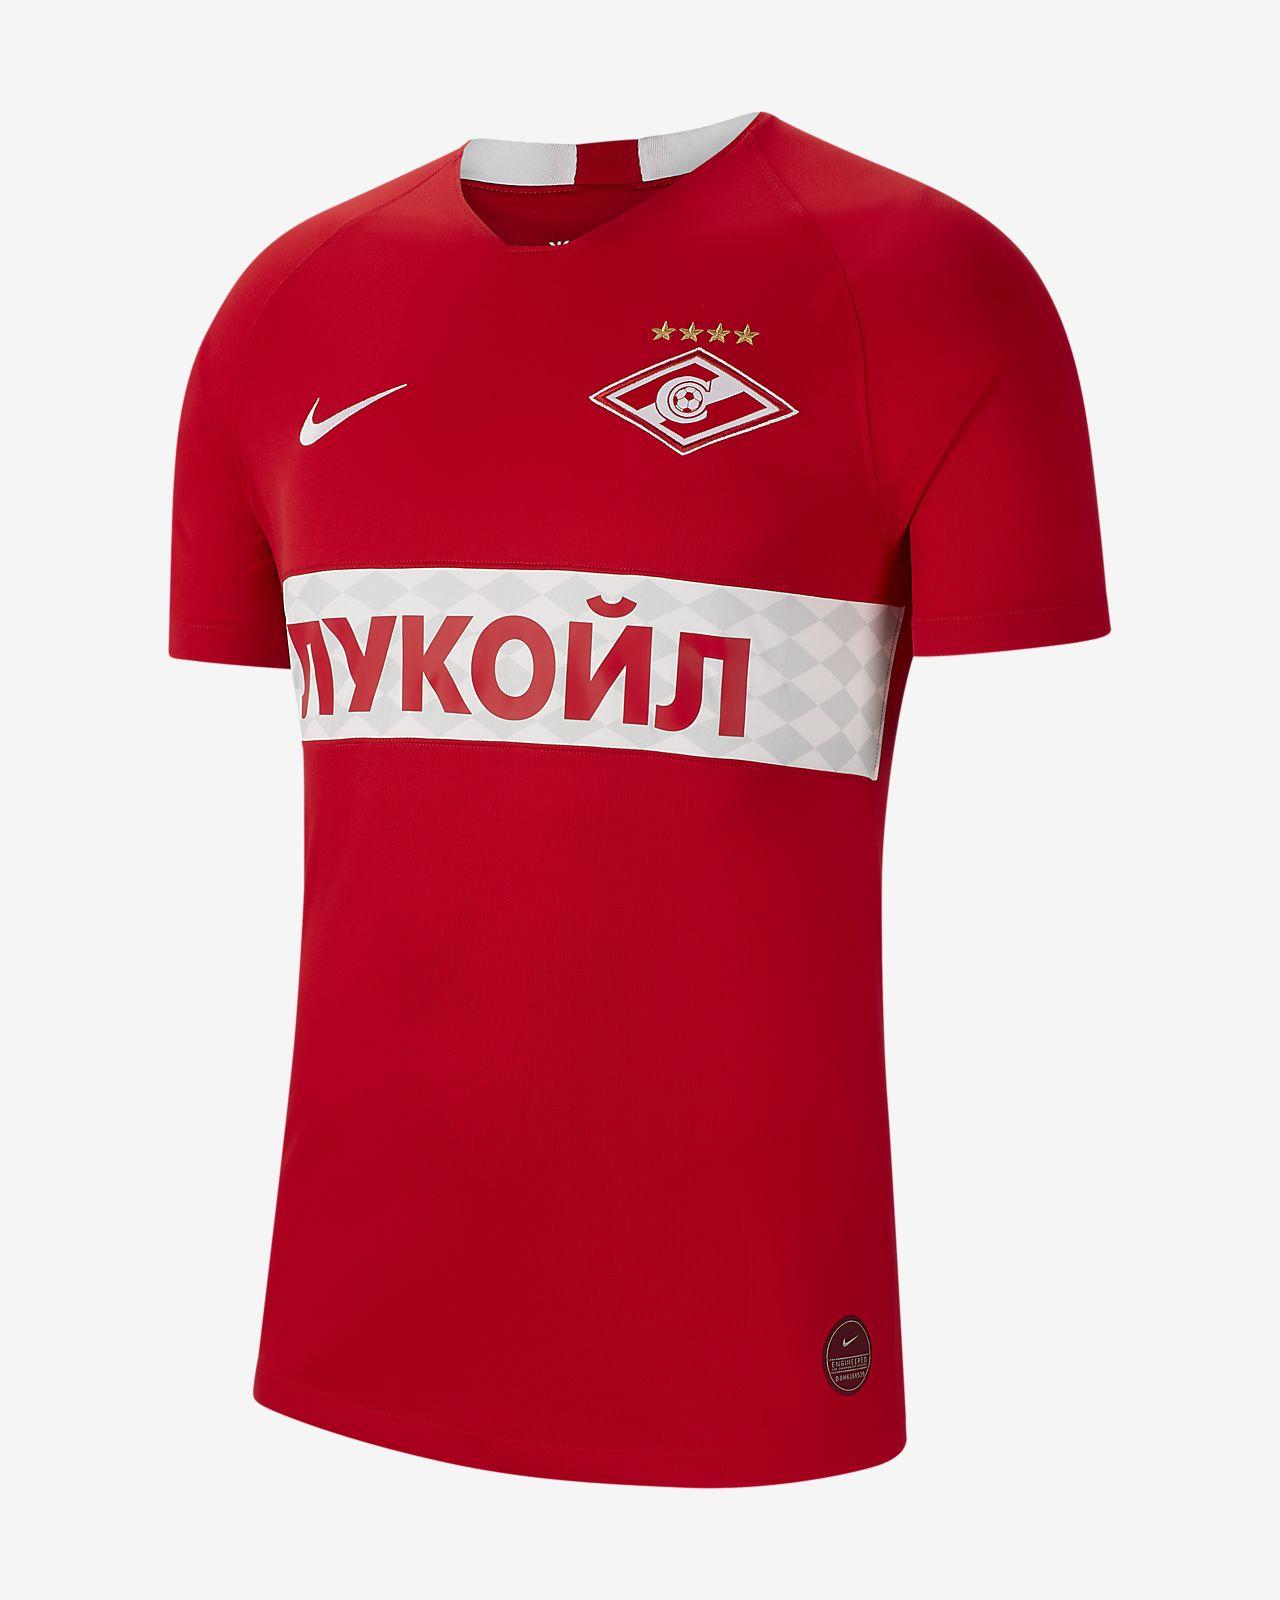 Maillot de football Spartak Moscow 2019/20 Stadium Home pour Homme